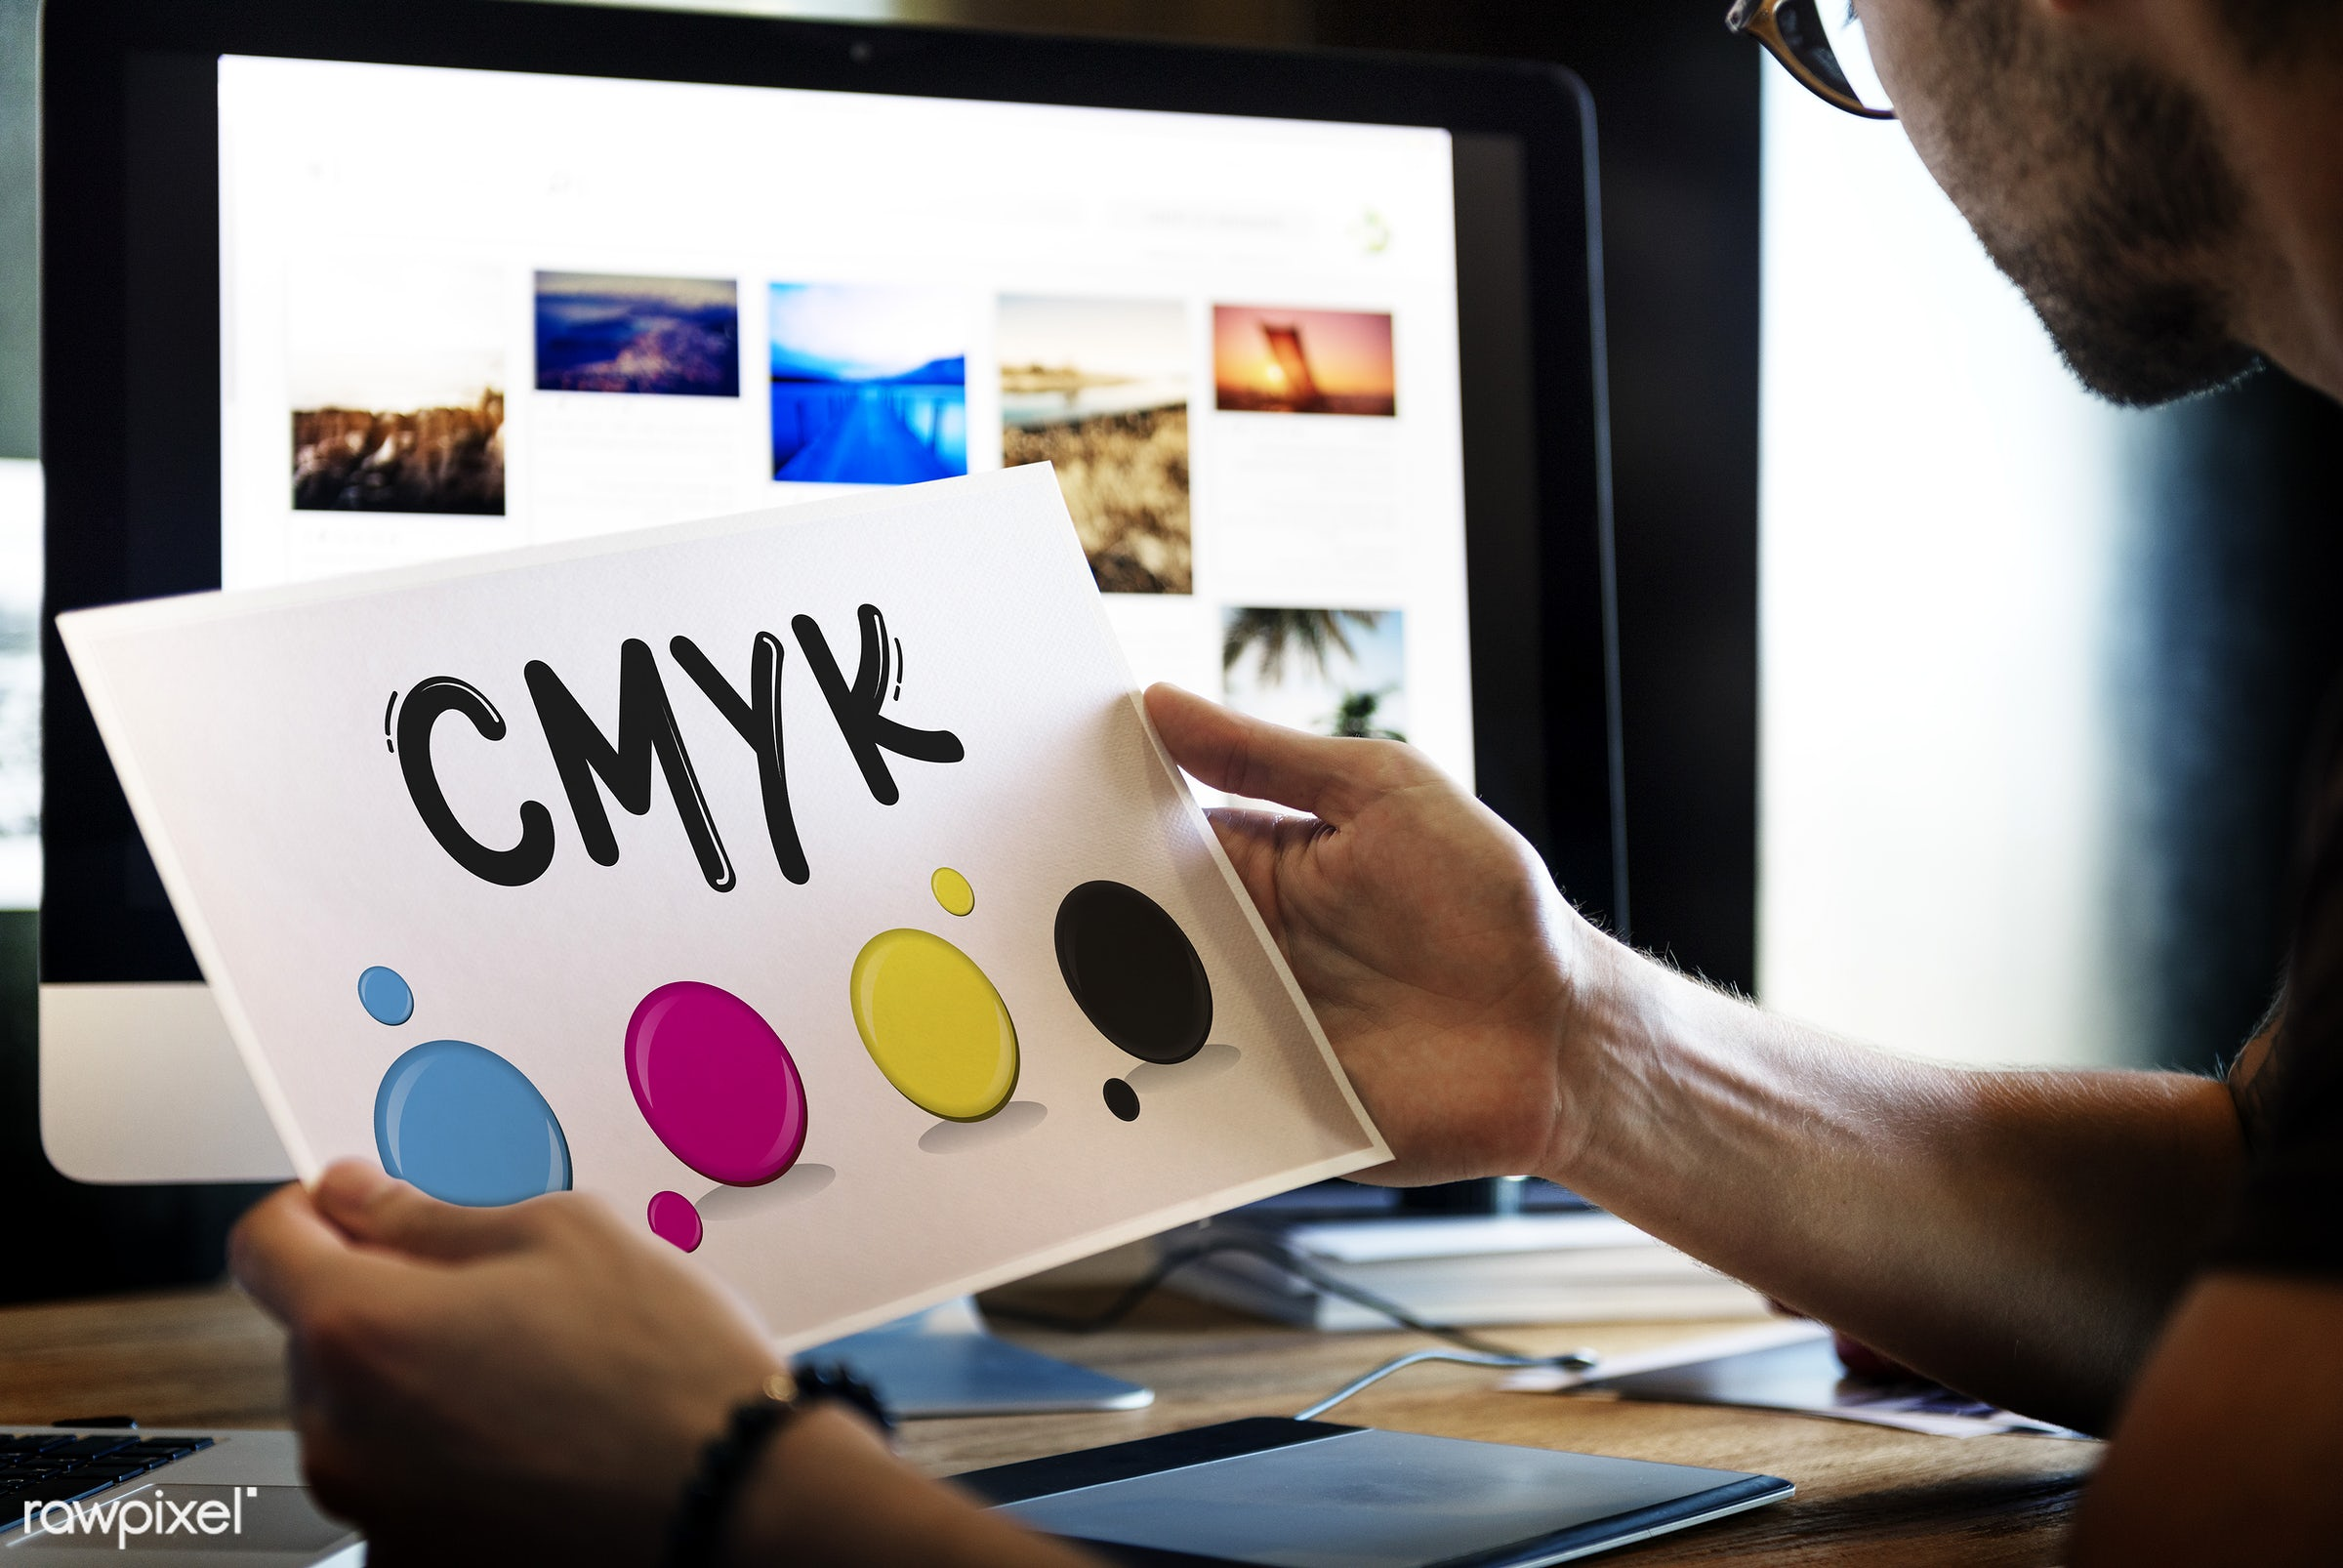 designer, cmyk, color, desk, analysing, color model, color printing, computer, creative, creative occupation, cyan, design,...